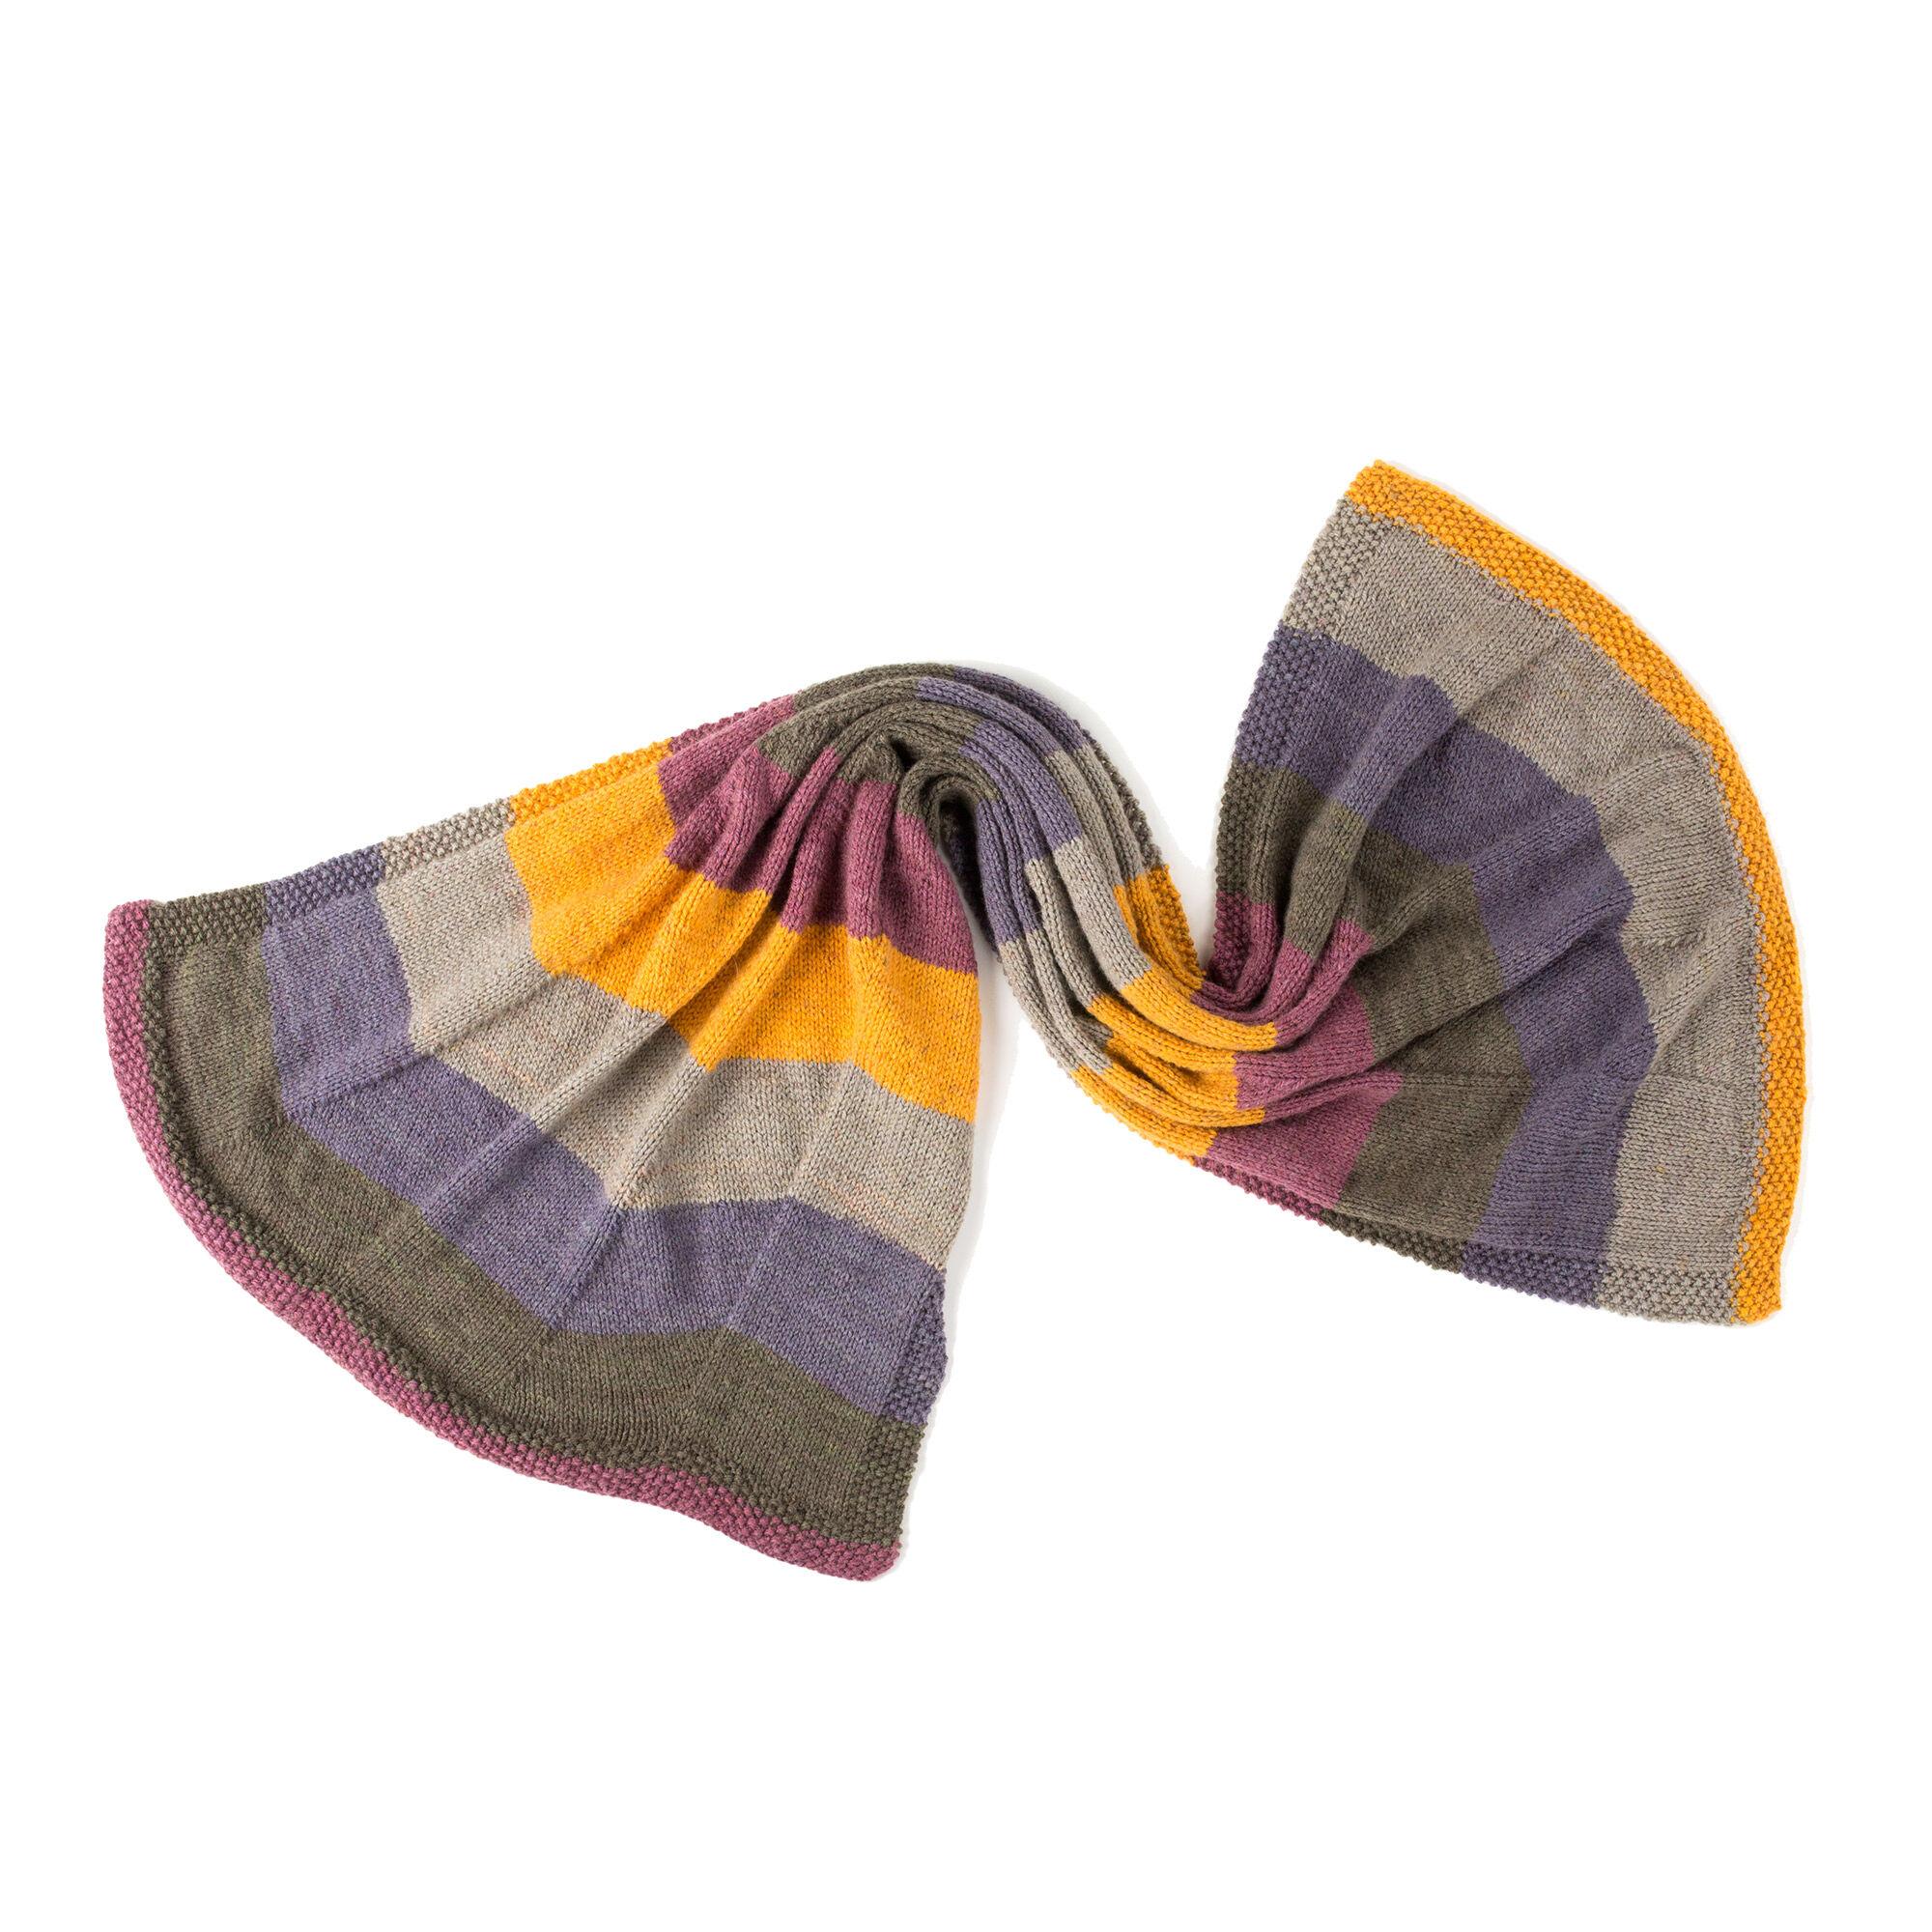 Caron Zig-Zag Knit Shawl Pattern | Yarnspirations